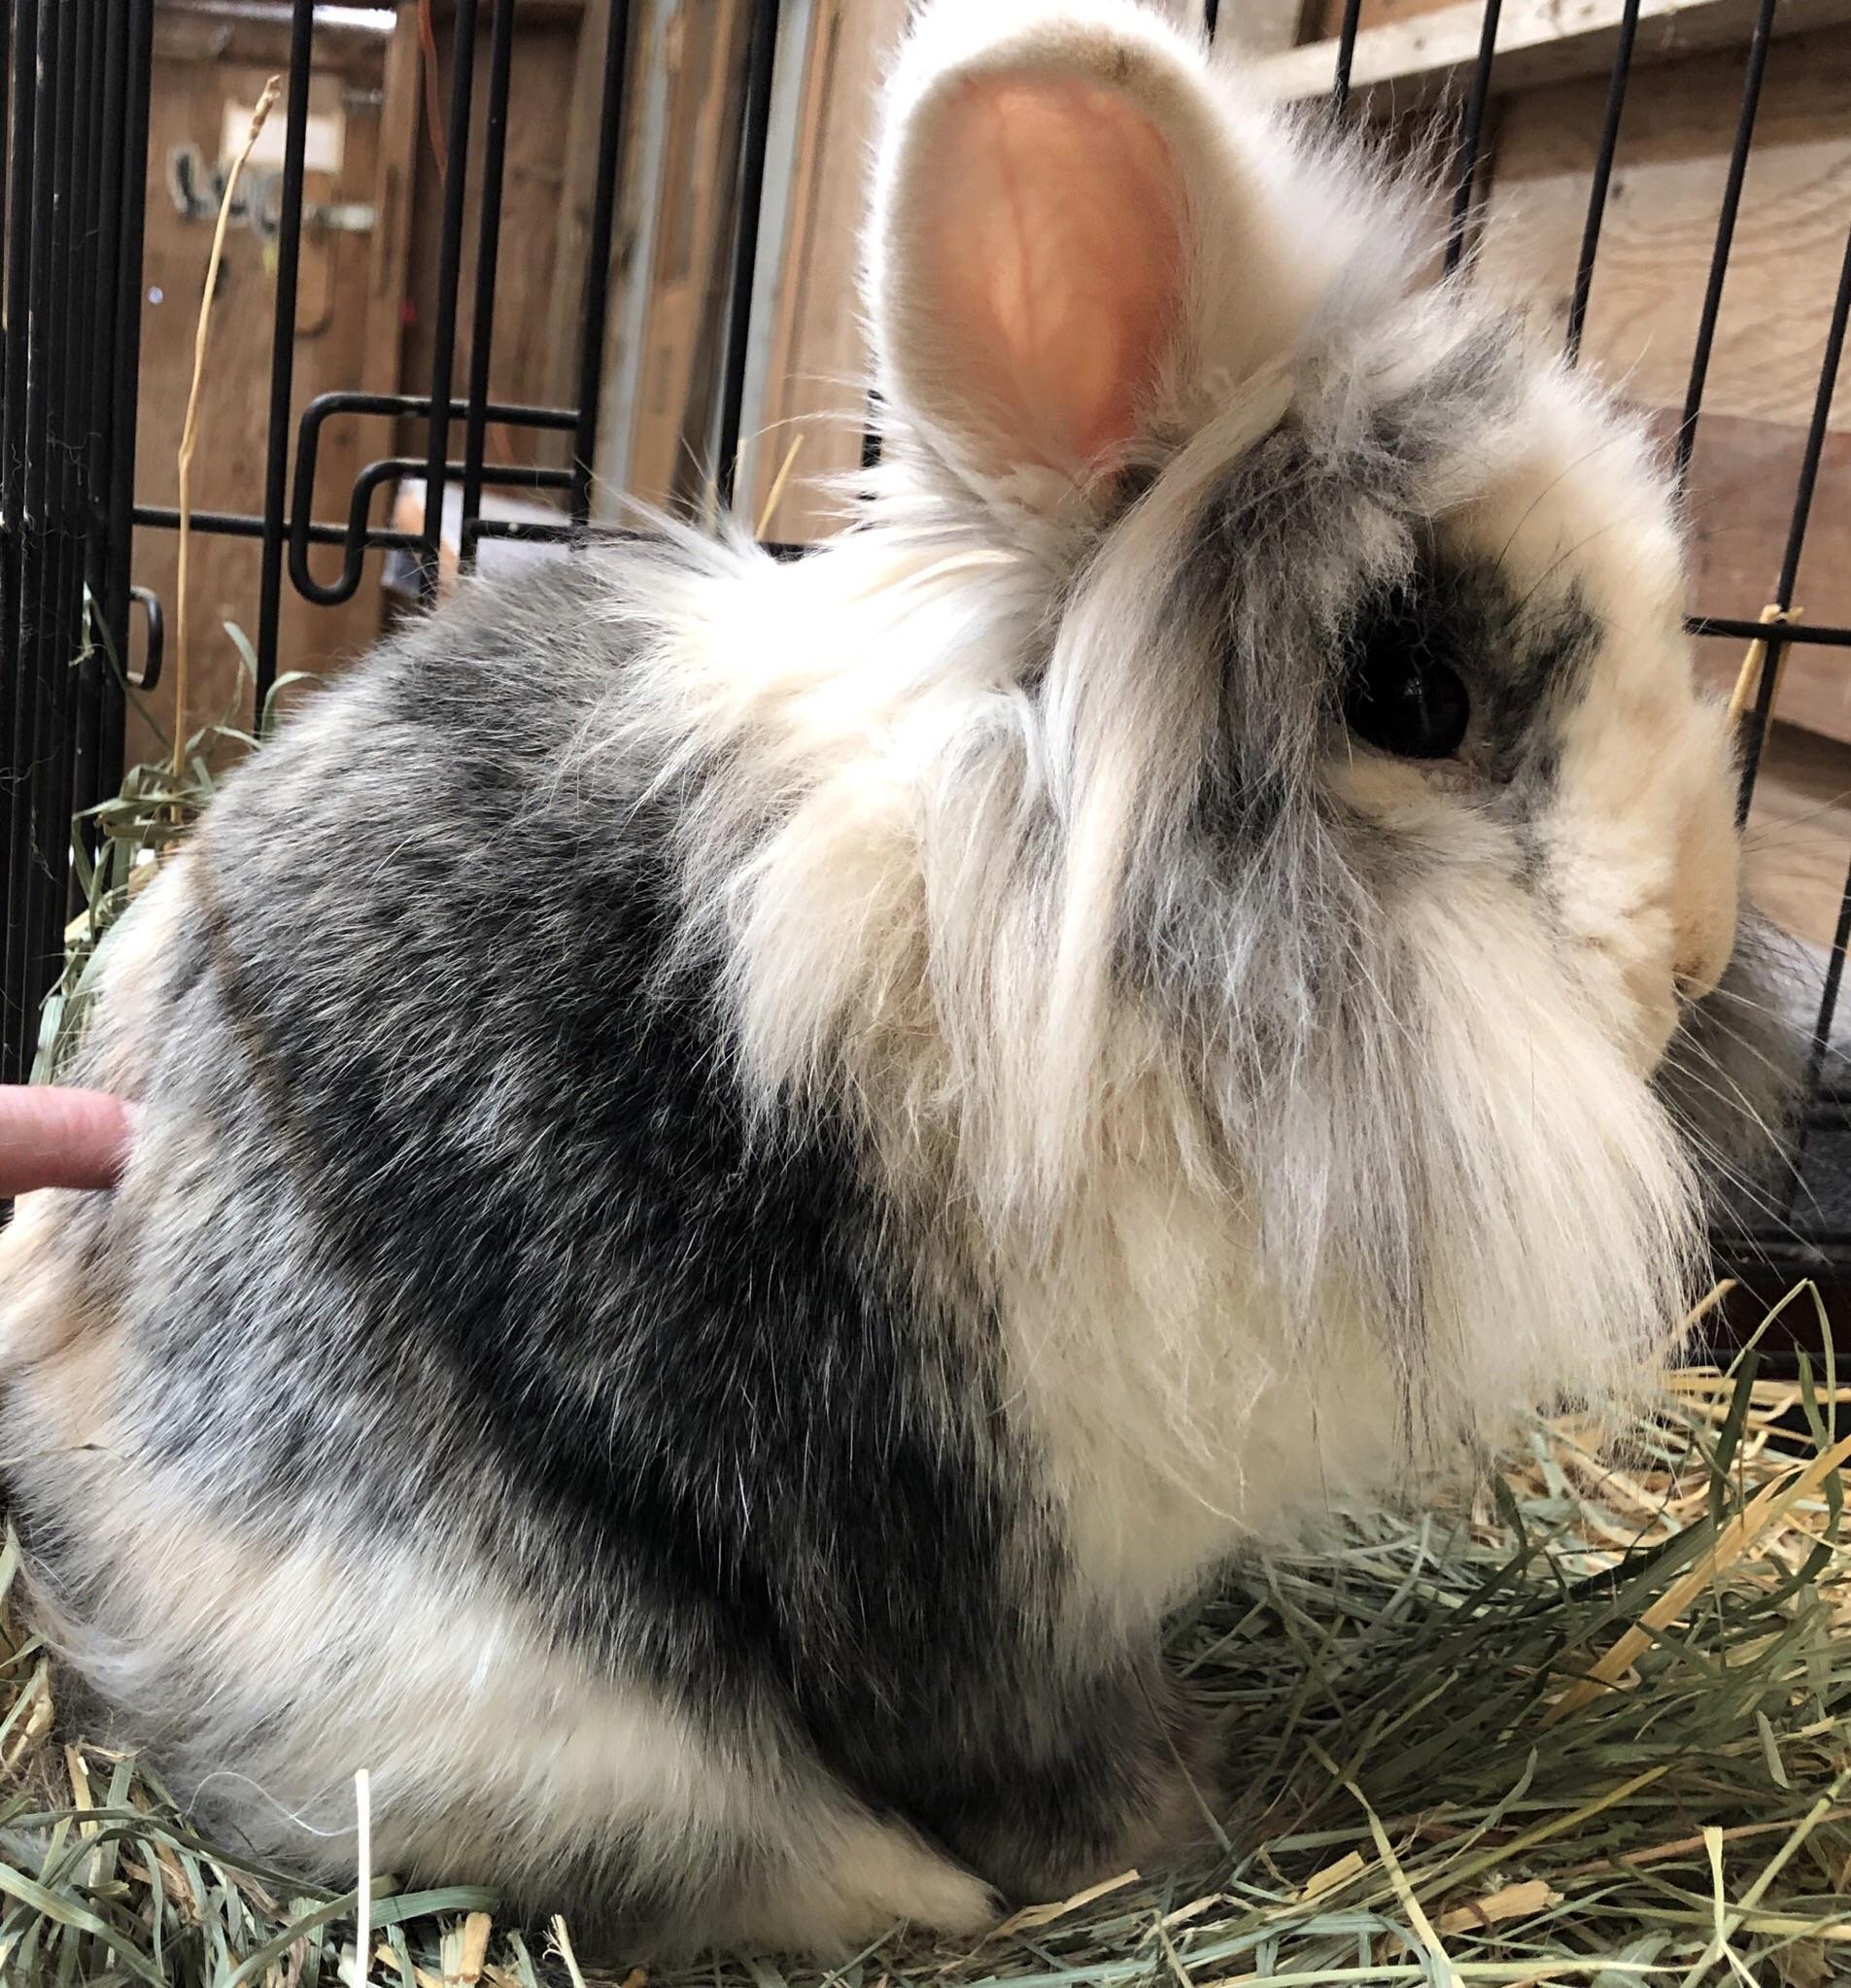 What To Buy Next For Your Bunny Rabbit Pet Bunny Pet Rabbit Care Pet Rabbit